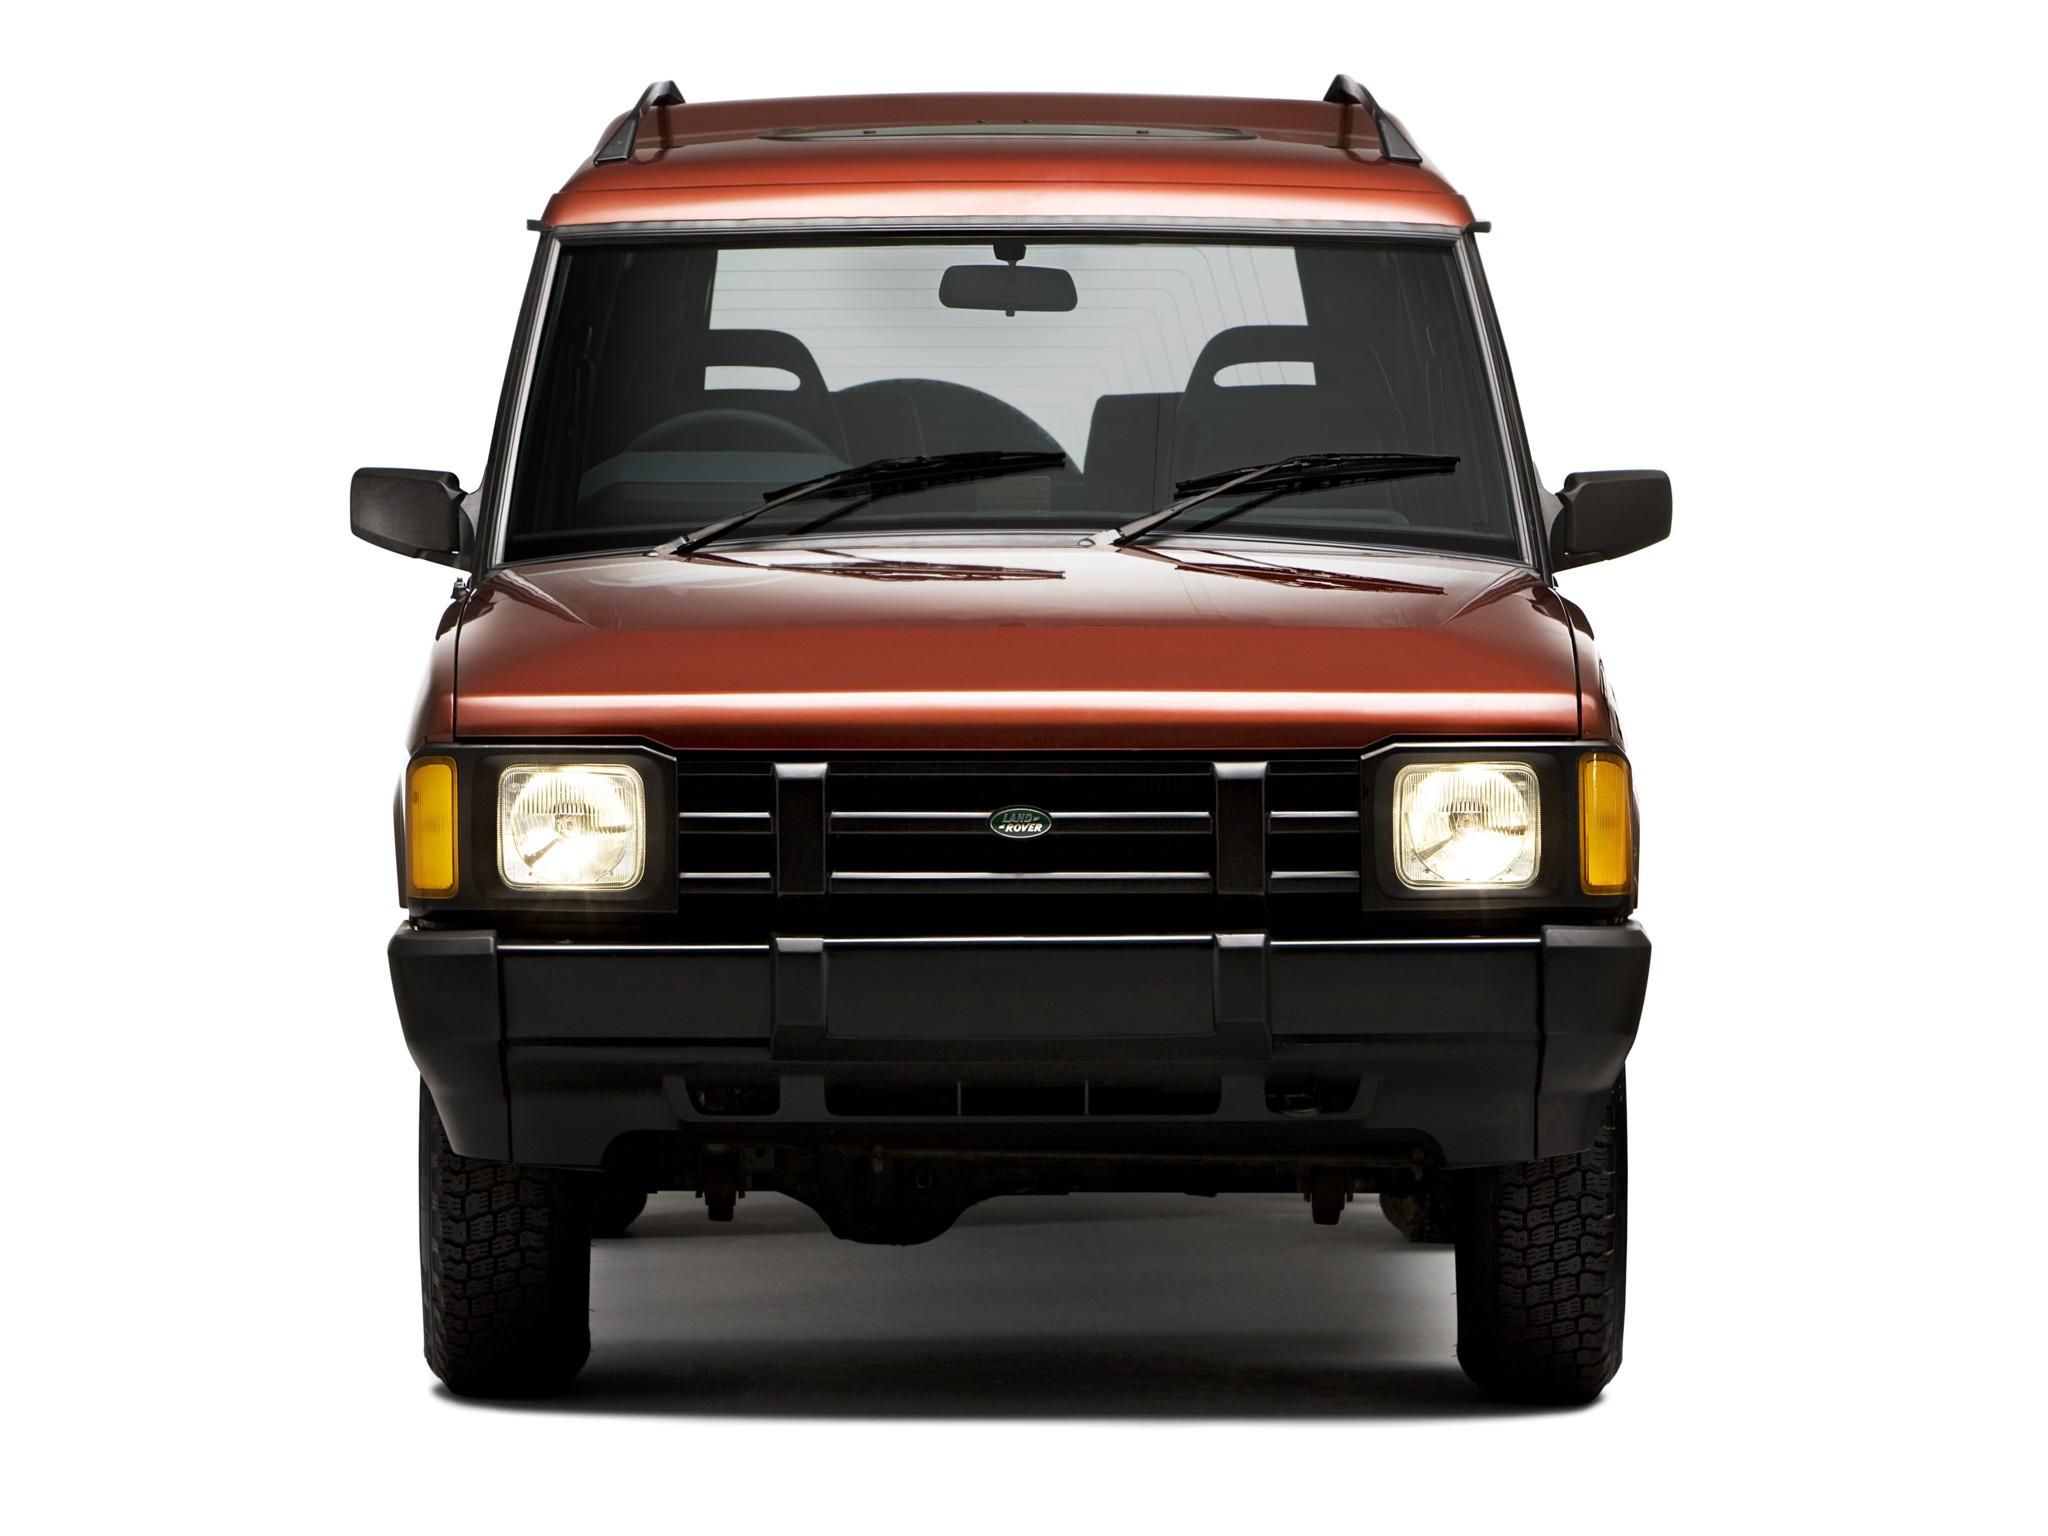 Land Rover Discovery I — легендарная модель